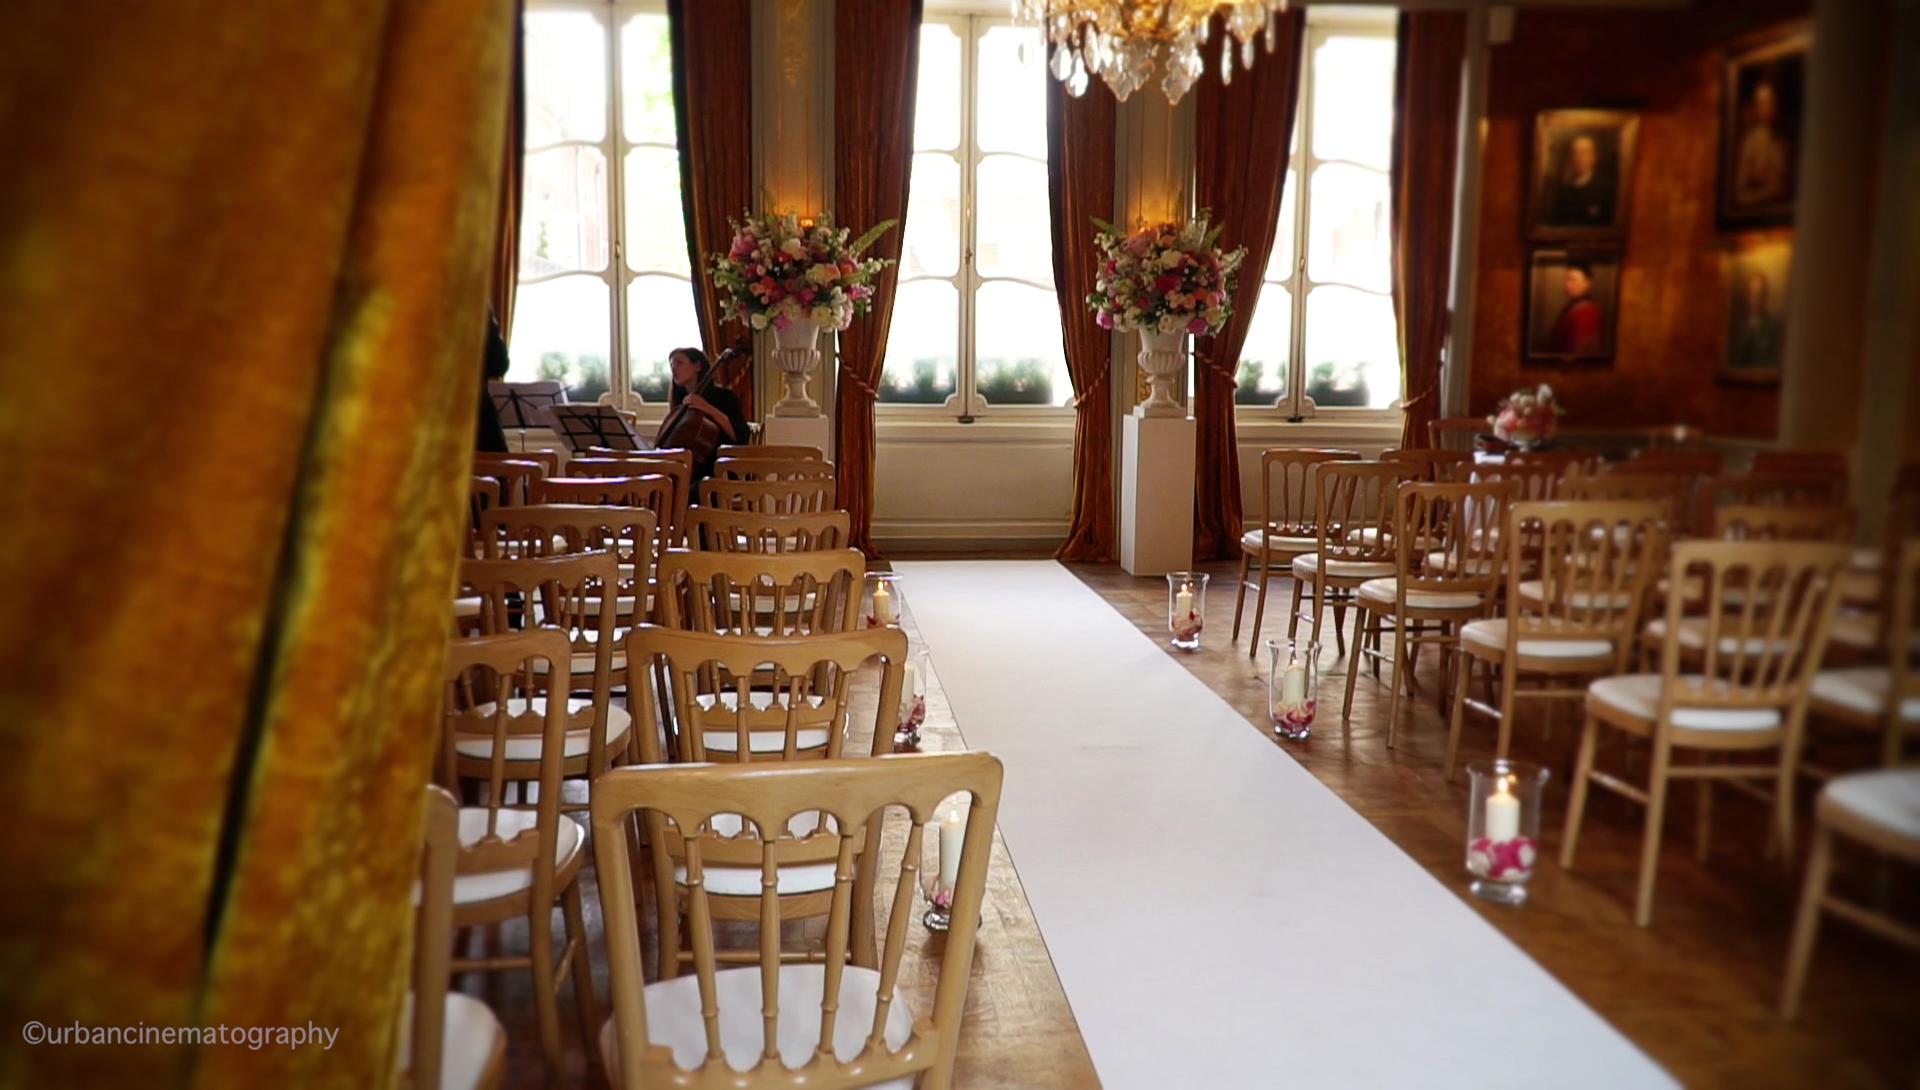 Ceremony Wedding VideographyThe Savile Club London